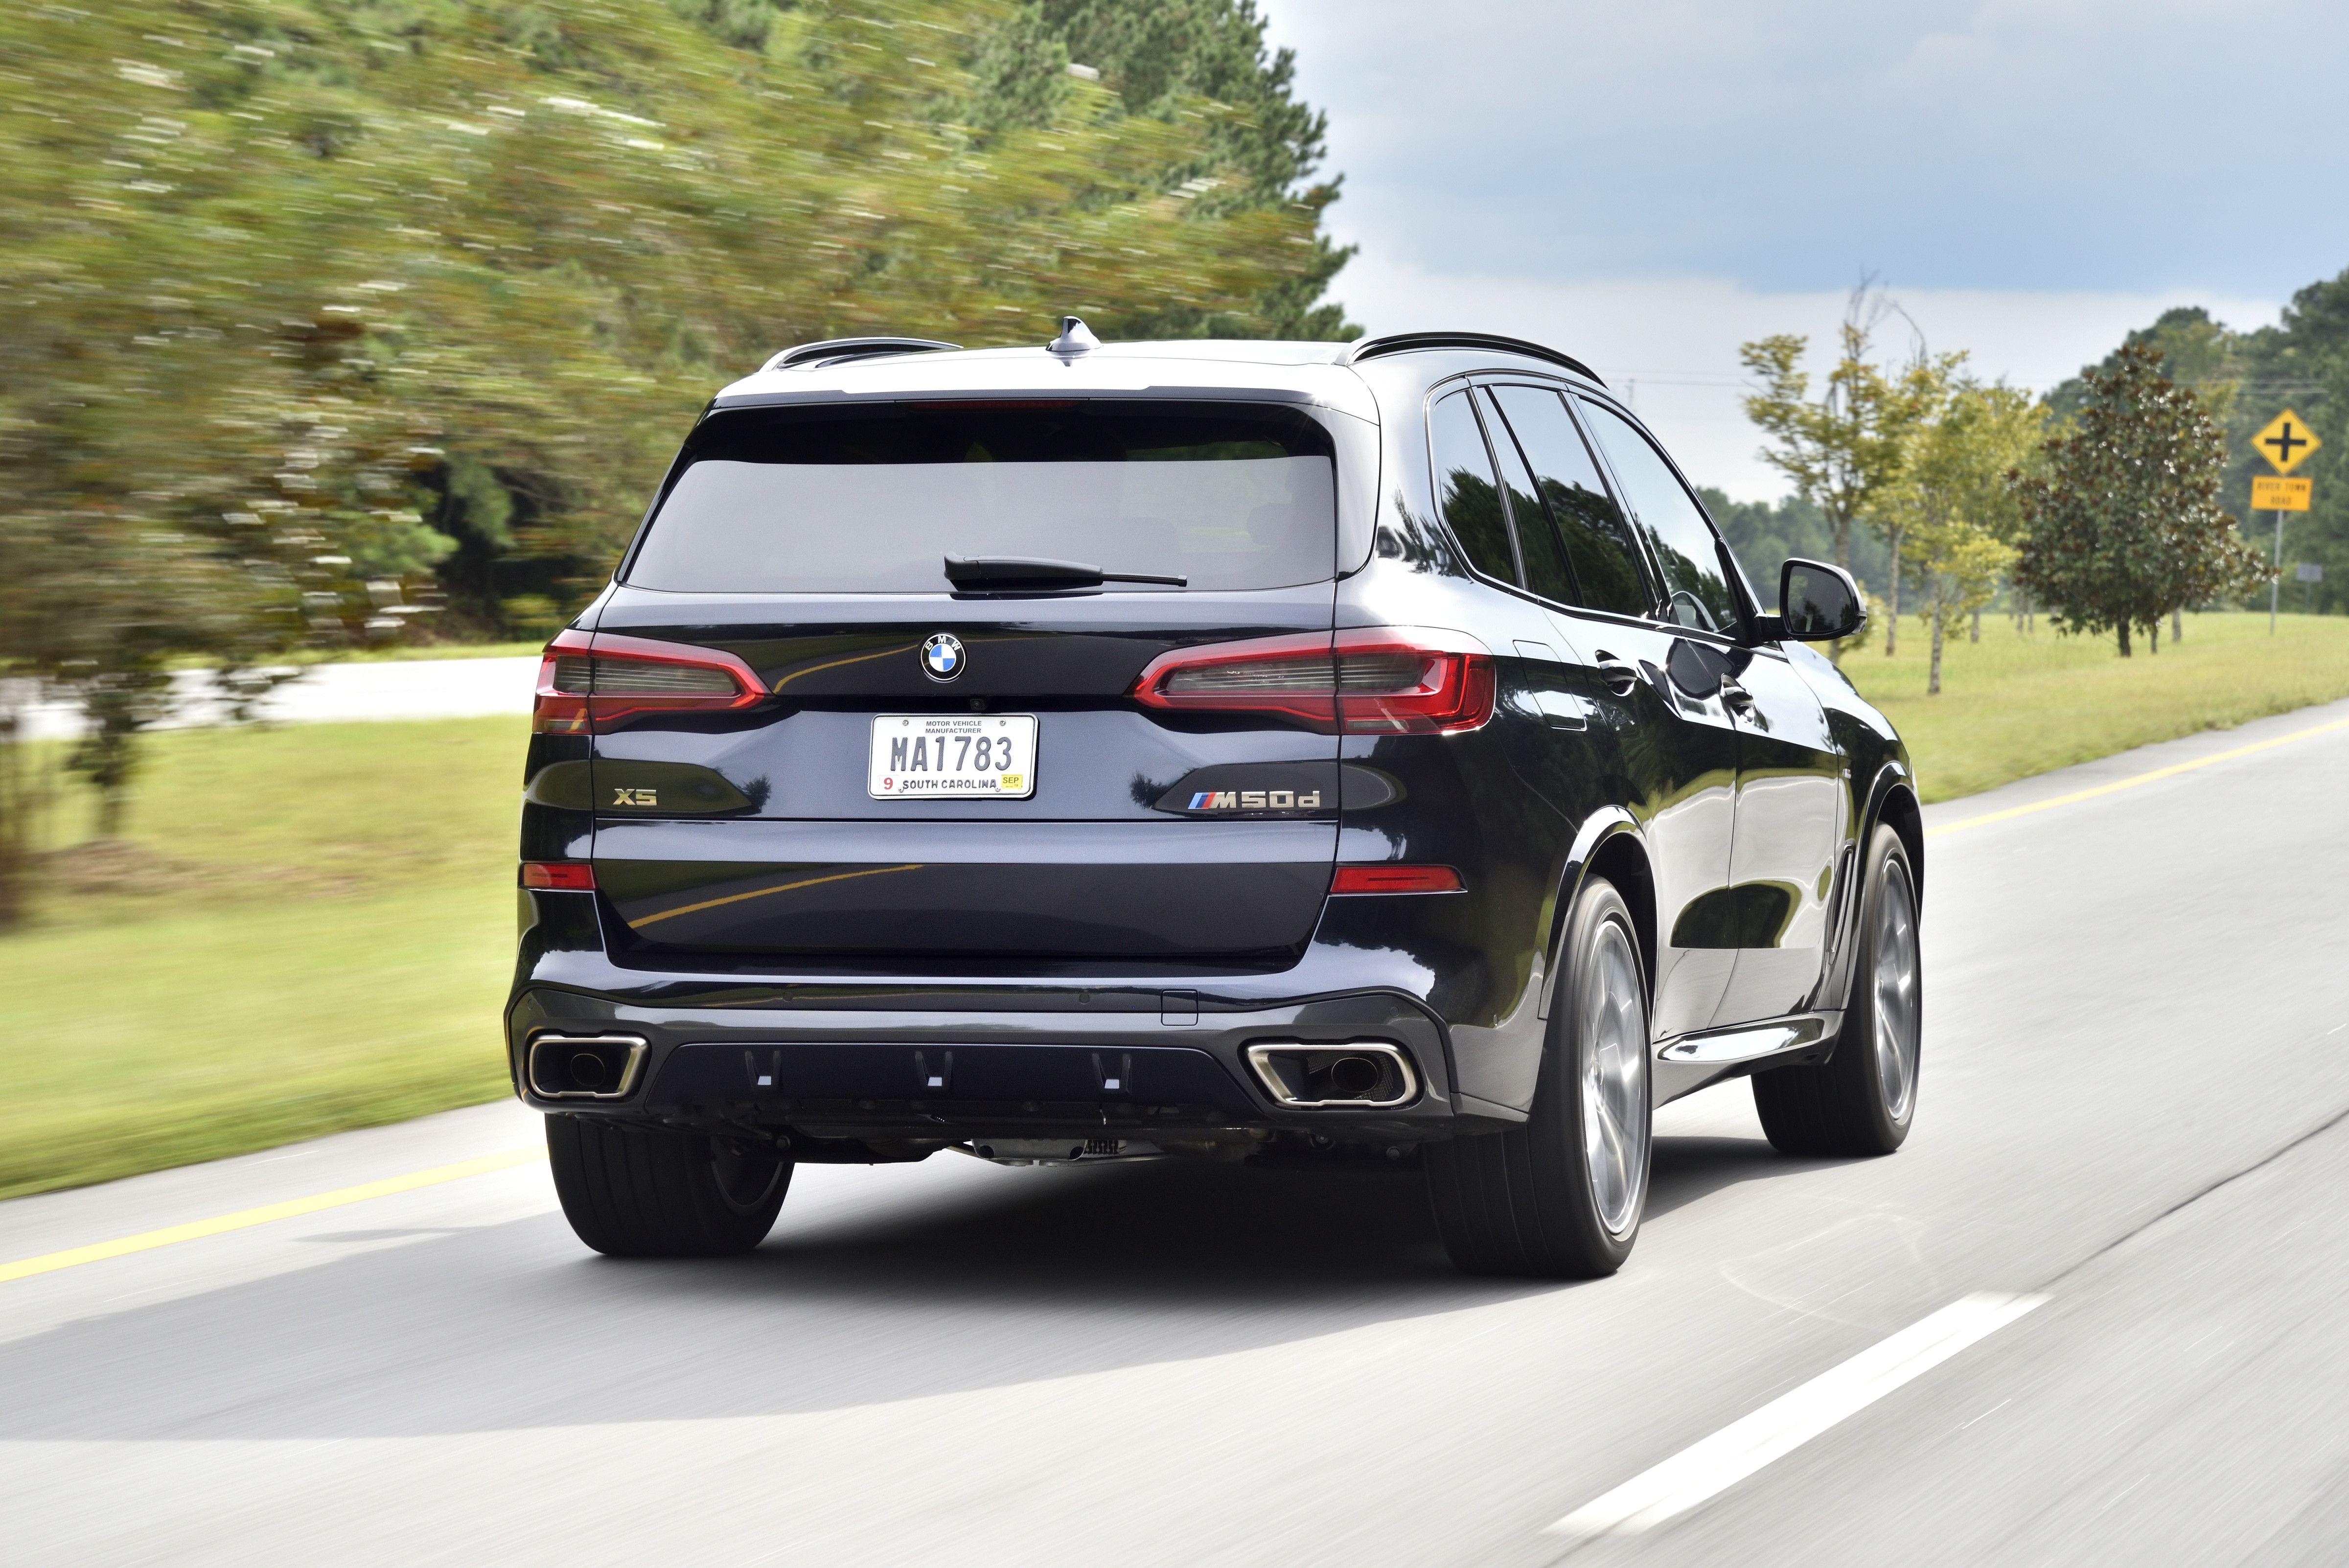 Pin By Bmw Life On Cars Bmw In 2020 Bmw Suv Bmw X5 Luxury Suv Cars